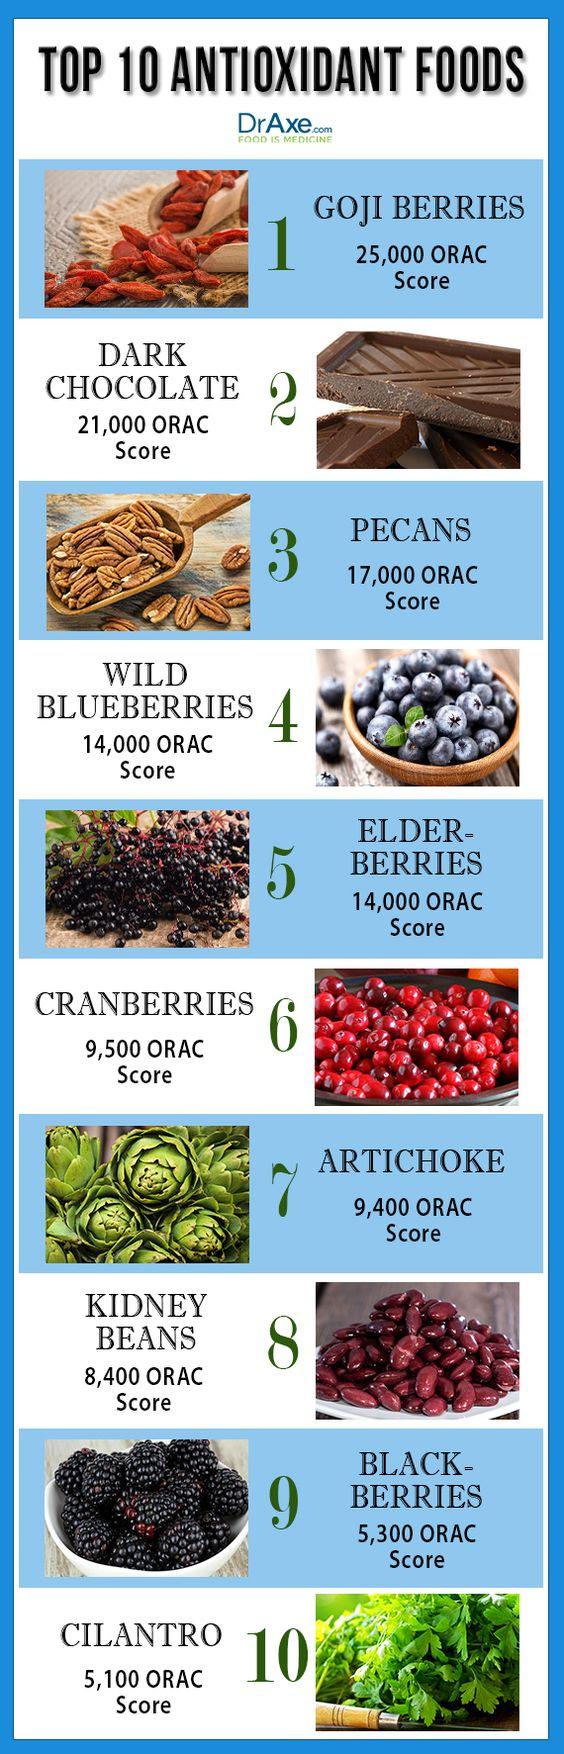 top 10 Antioxidant foods list: